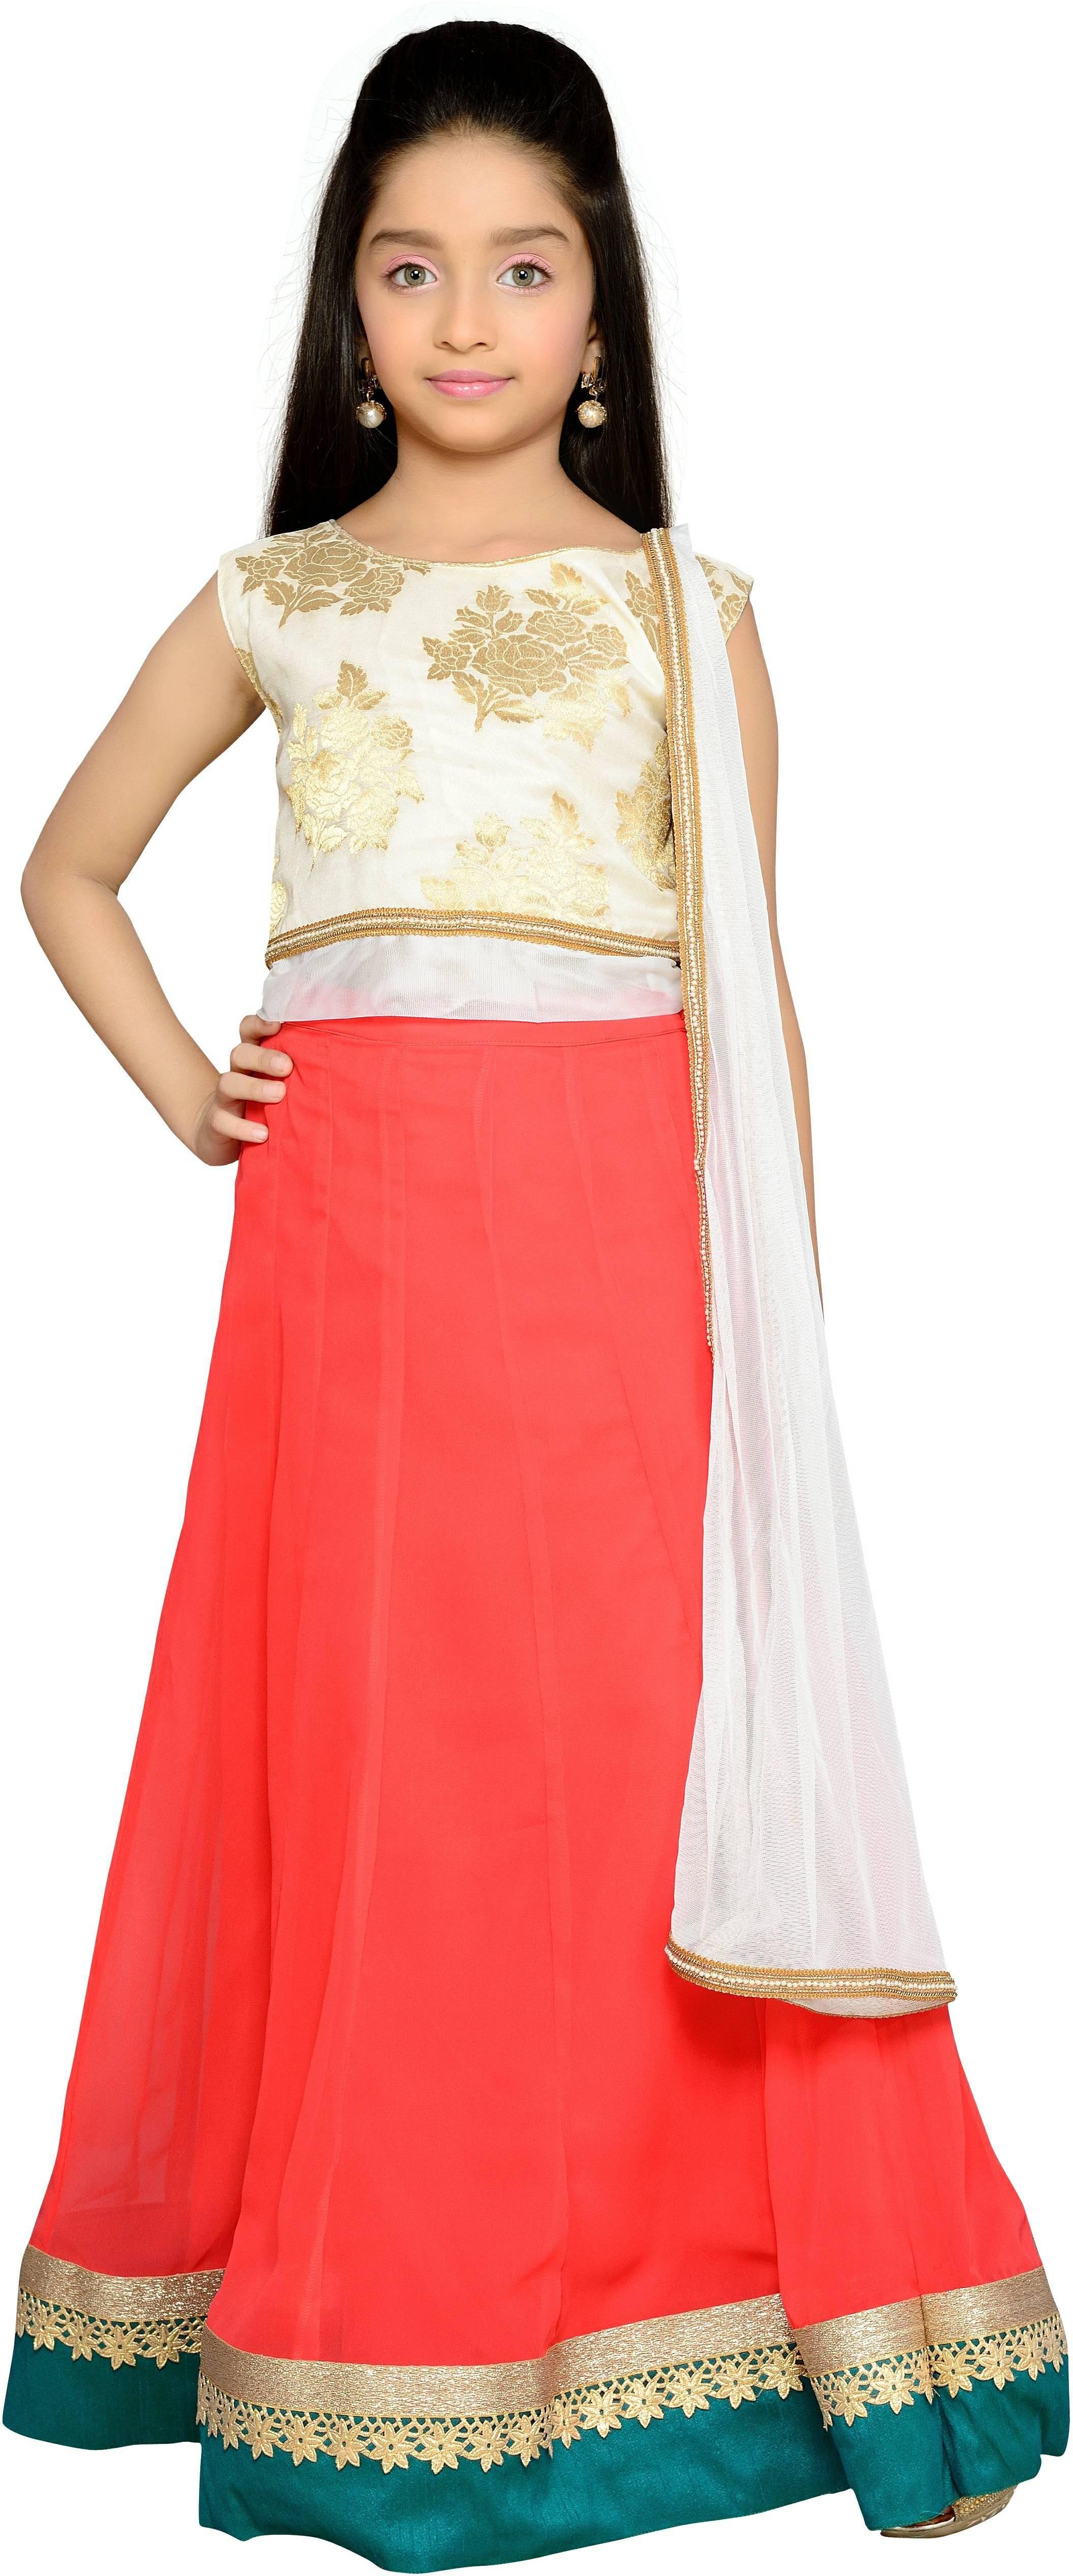 K&U Girls Lehenga Choli Fusion Wear, Ethnic Wear Self Design Lehenga, Choli and Dupatta Set(White, Pack of 1)